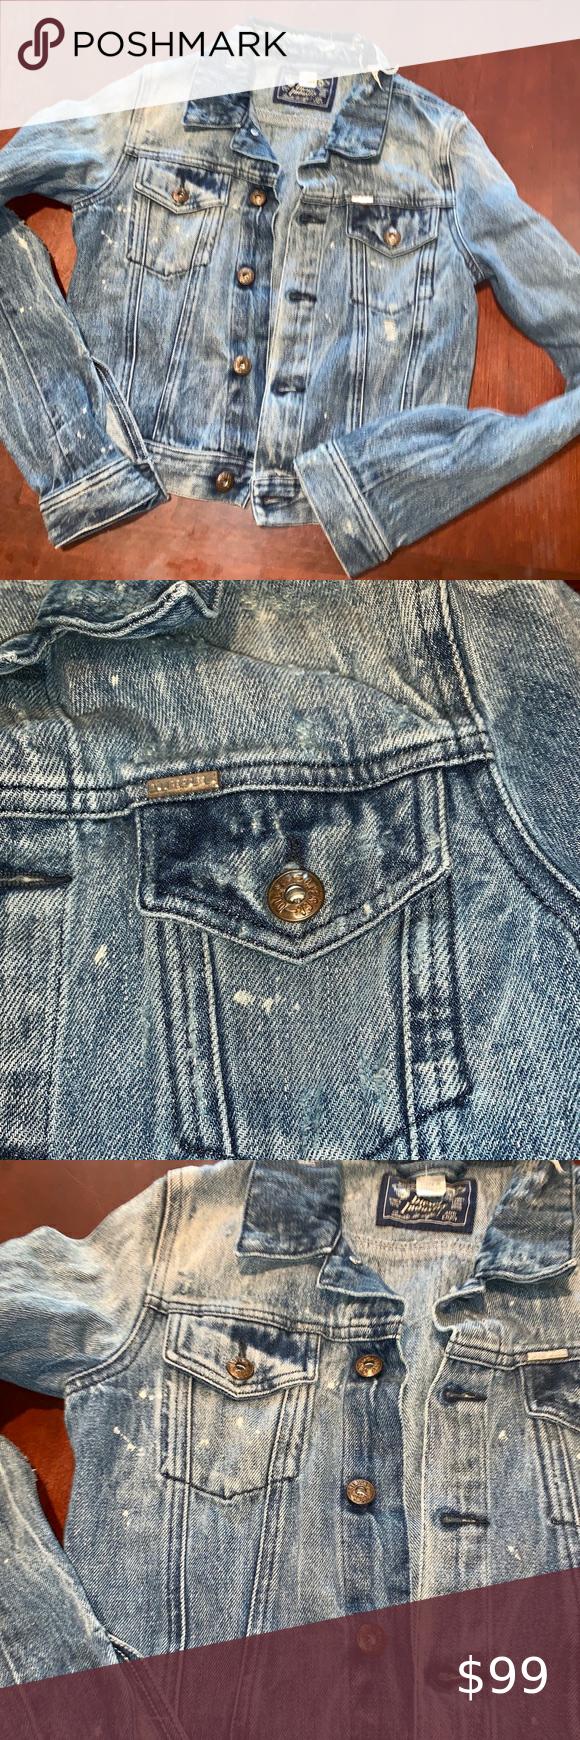 Diesel Distressed Faded Button Up Jean Jacket Diesel Denim Jacket Vintage Leather Jacket Vintage Denim Jacket [ 1740 x 580 Pixel ]